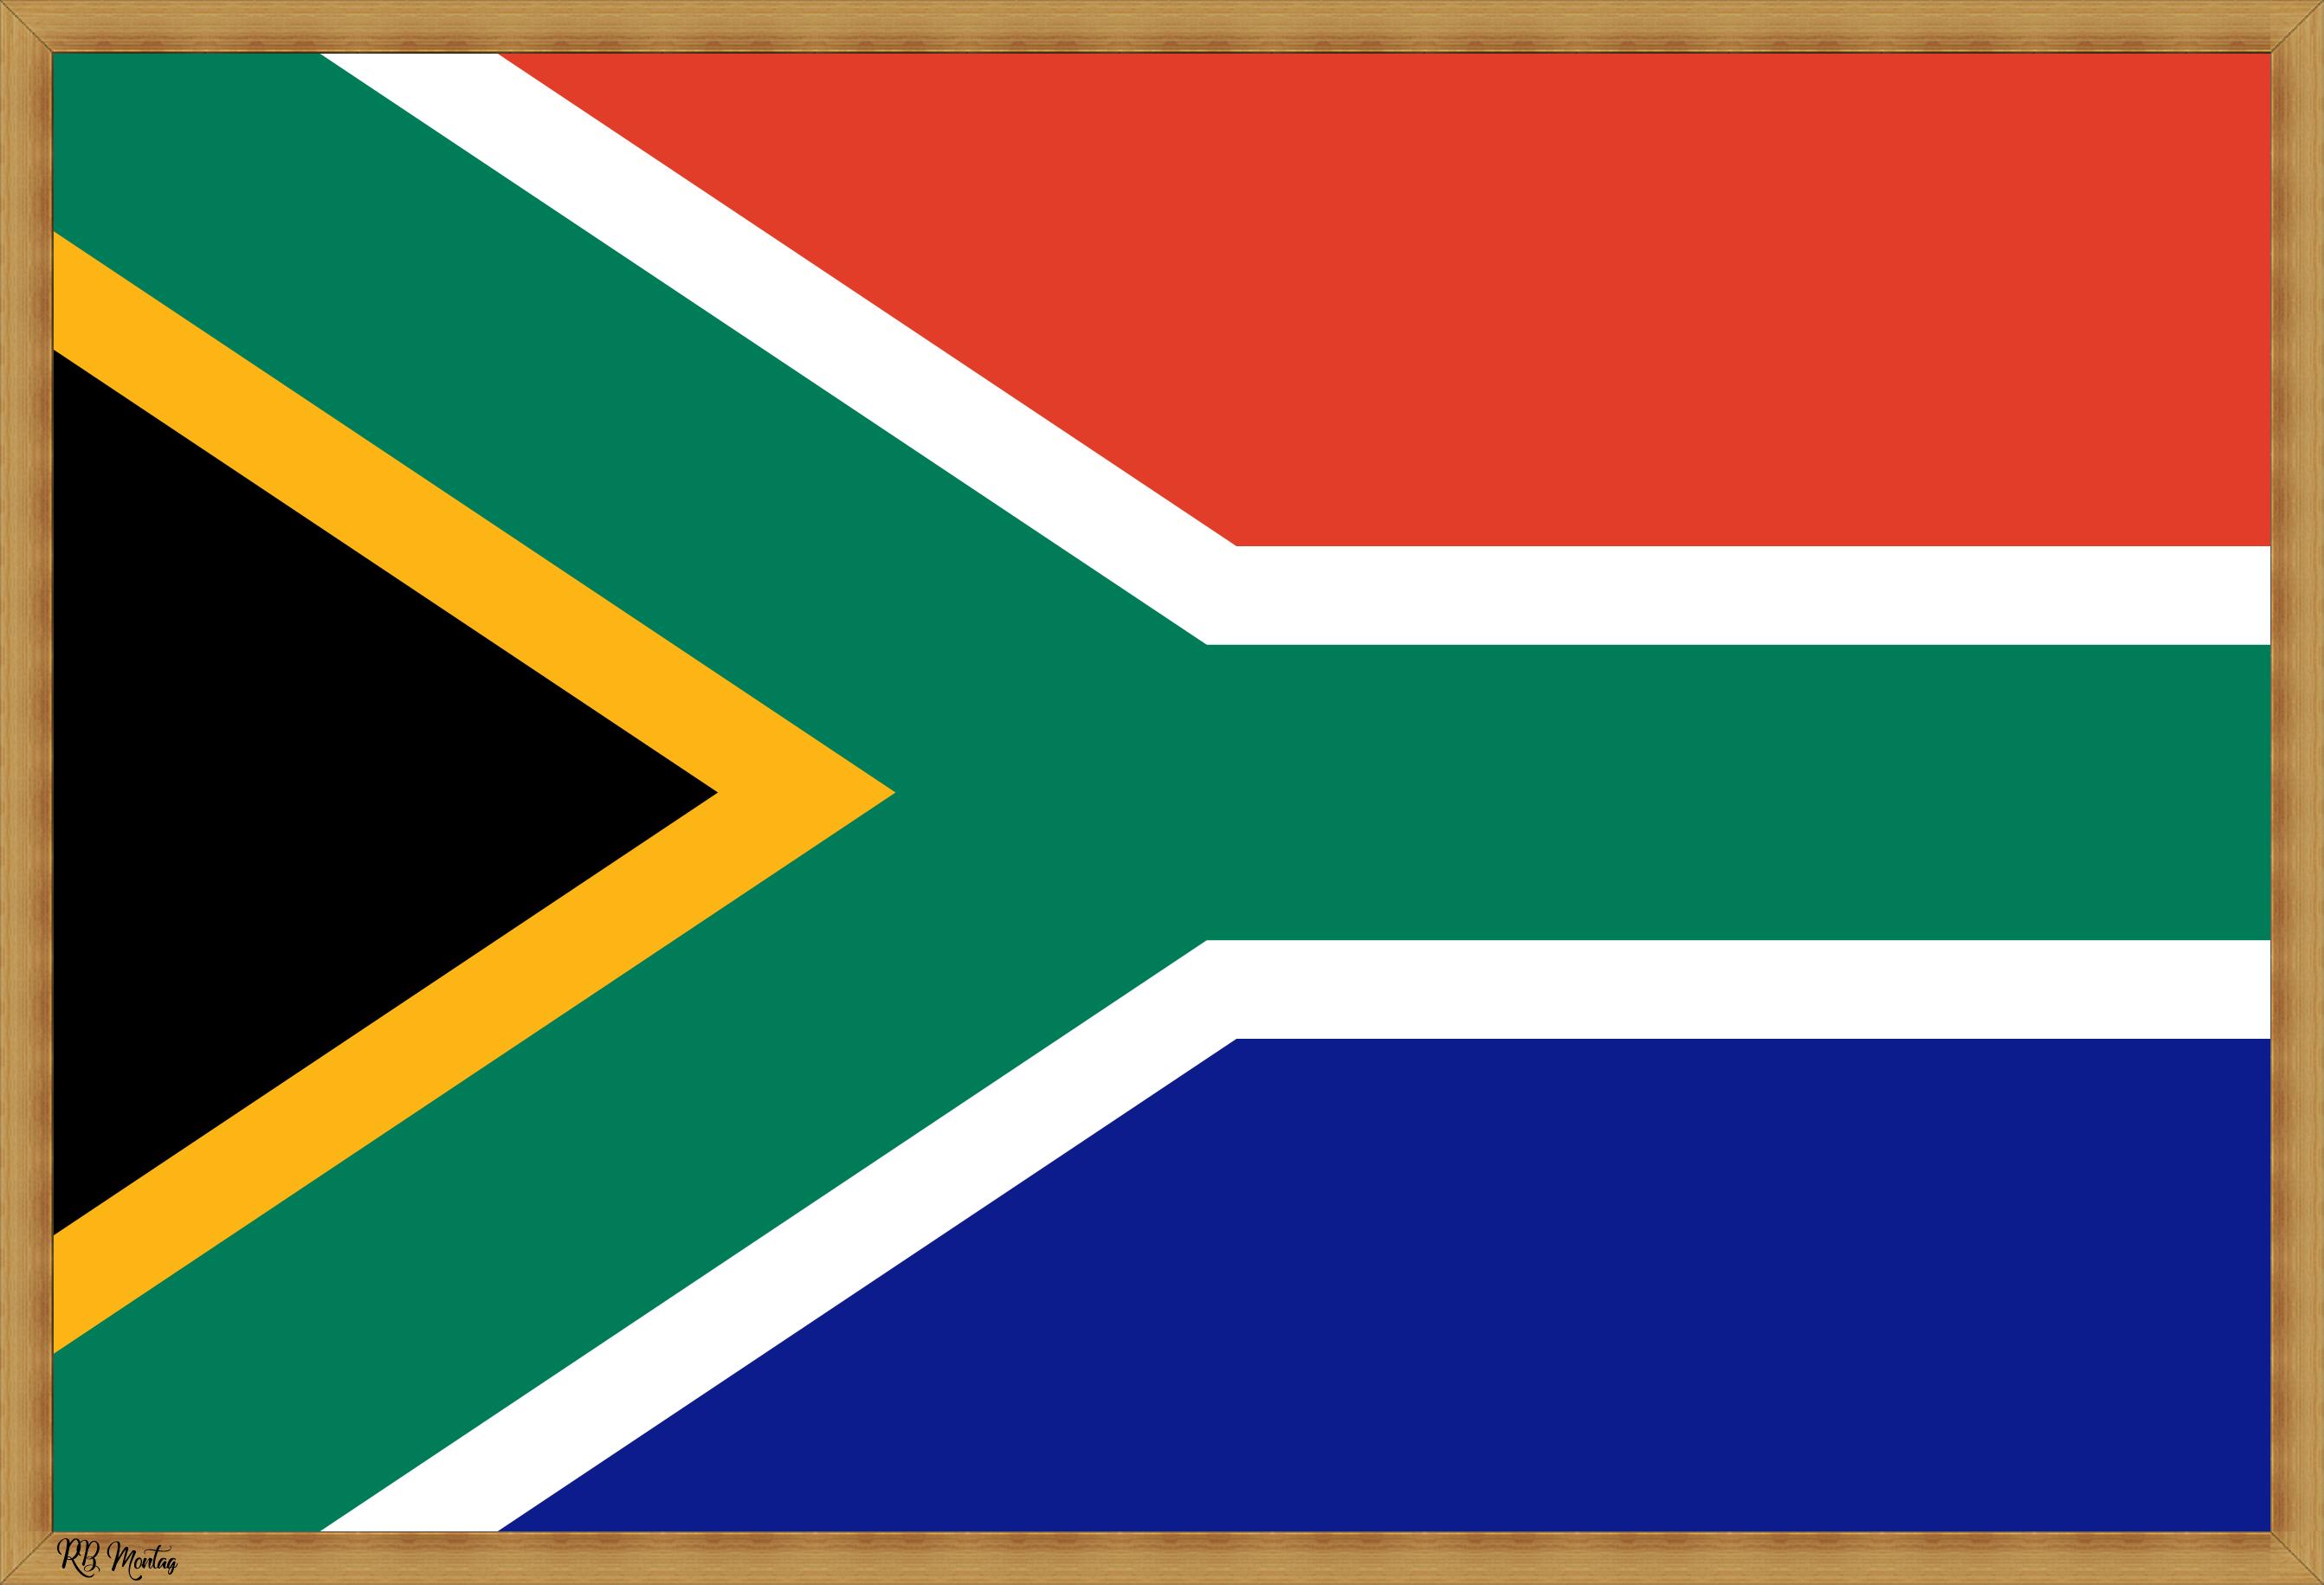 frica do Sul Republic of South Africa inglªs Republiek van Suid